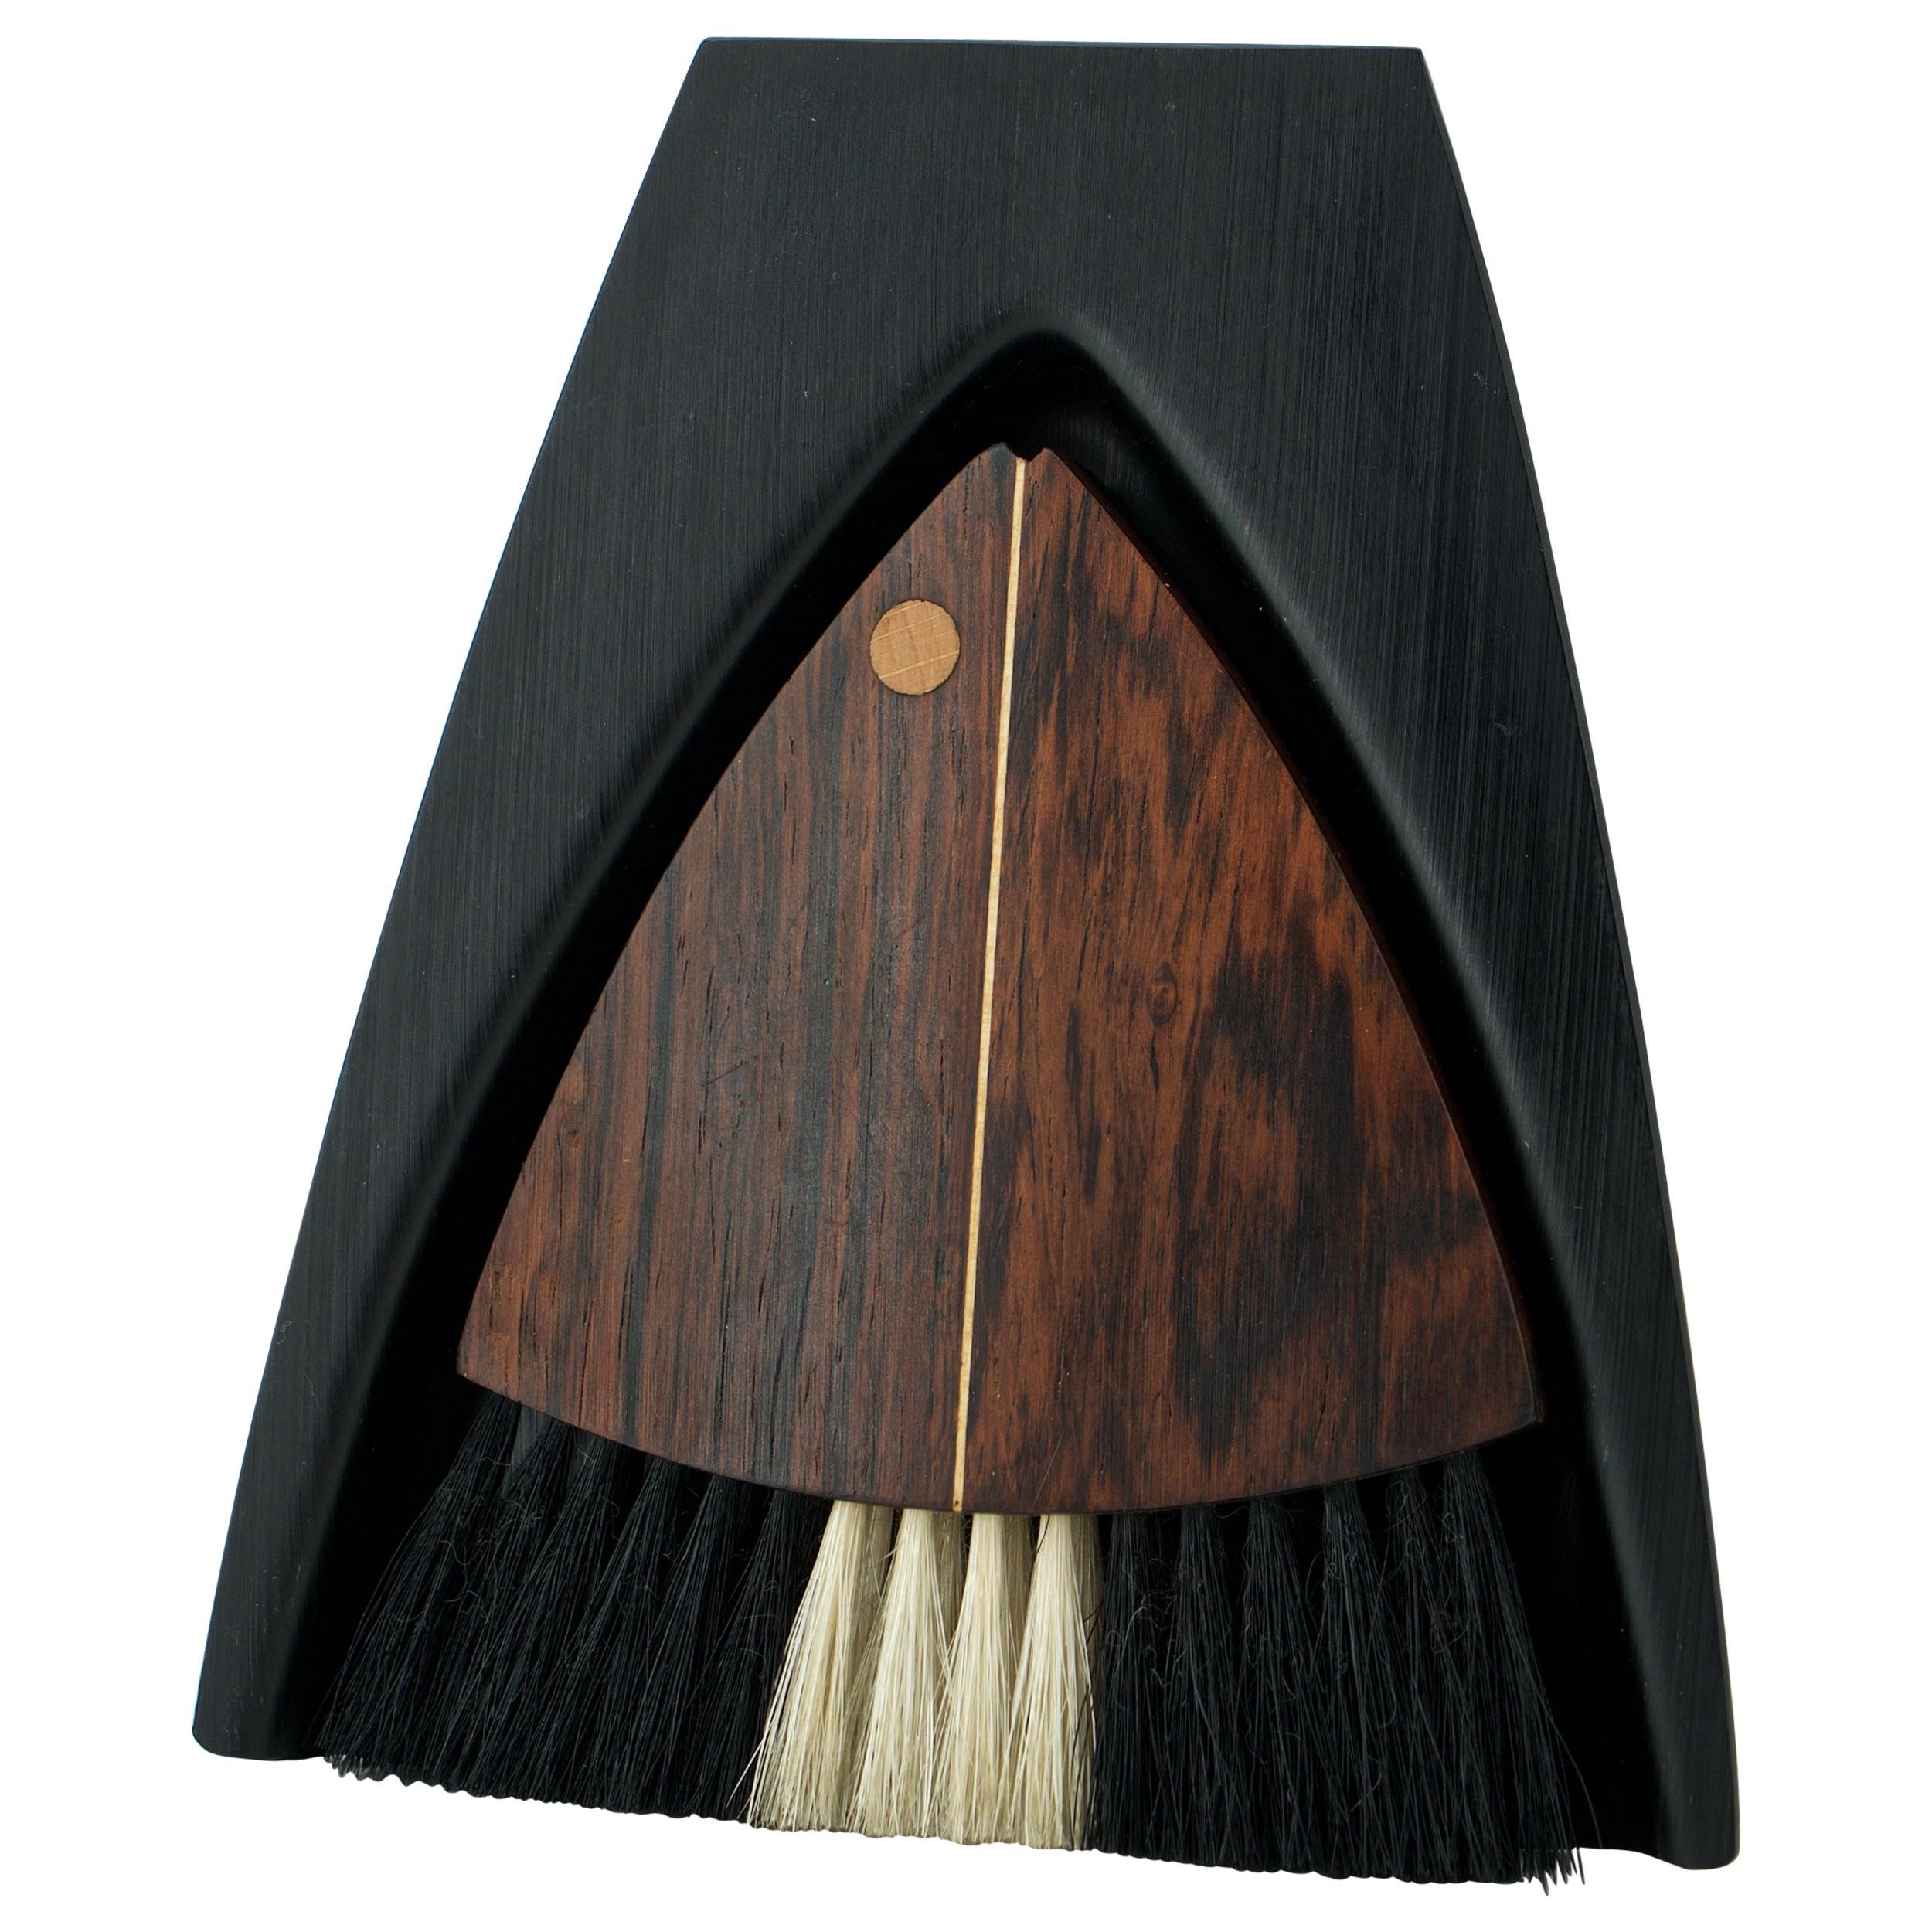 Danish Rosewood Table Crumb Brush Dust Pan Tray Bold Graphic Midcentury Design